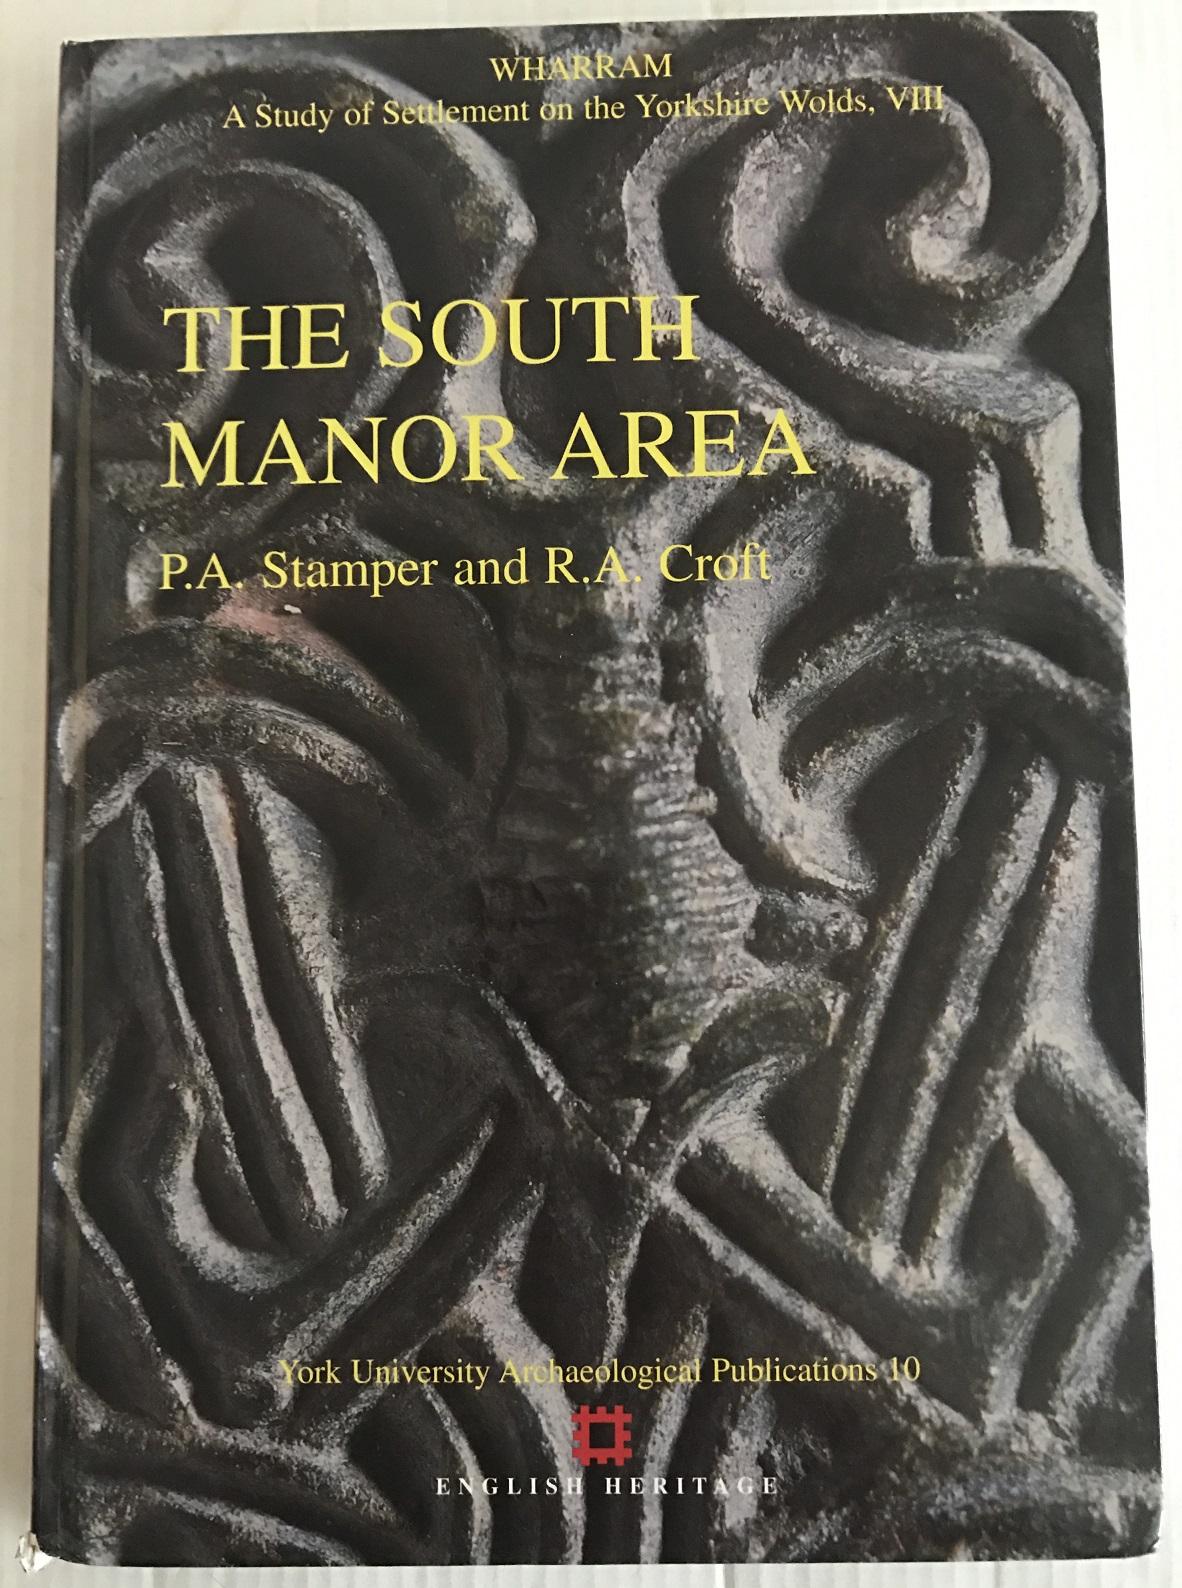 The South Manor Area :, P A Stamper ;et al (eds)